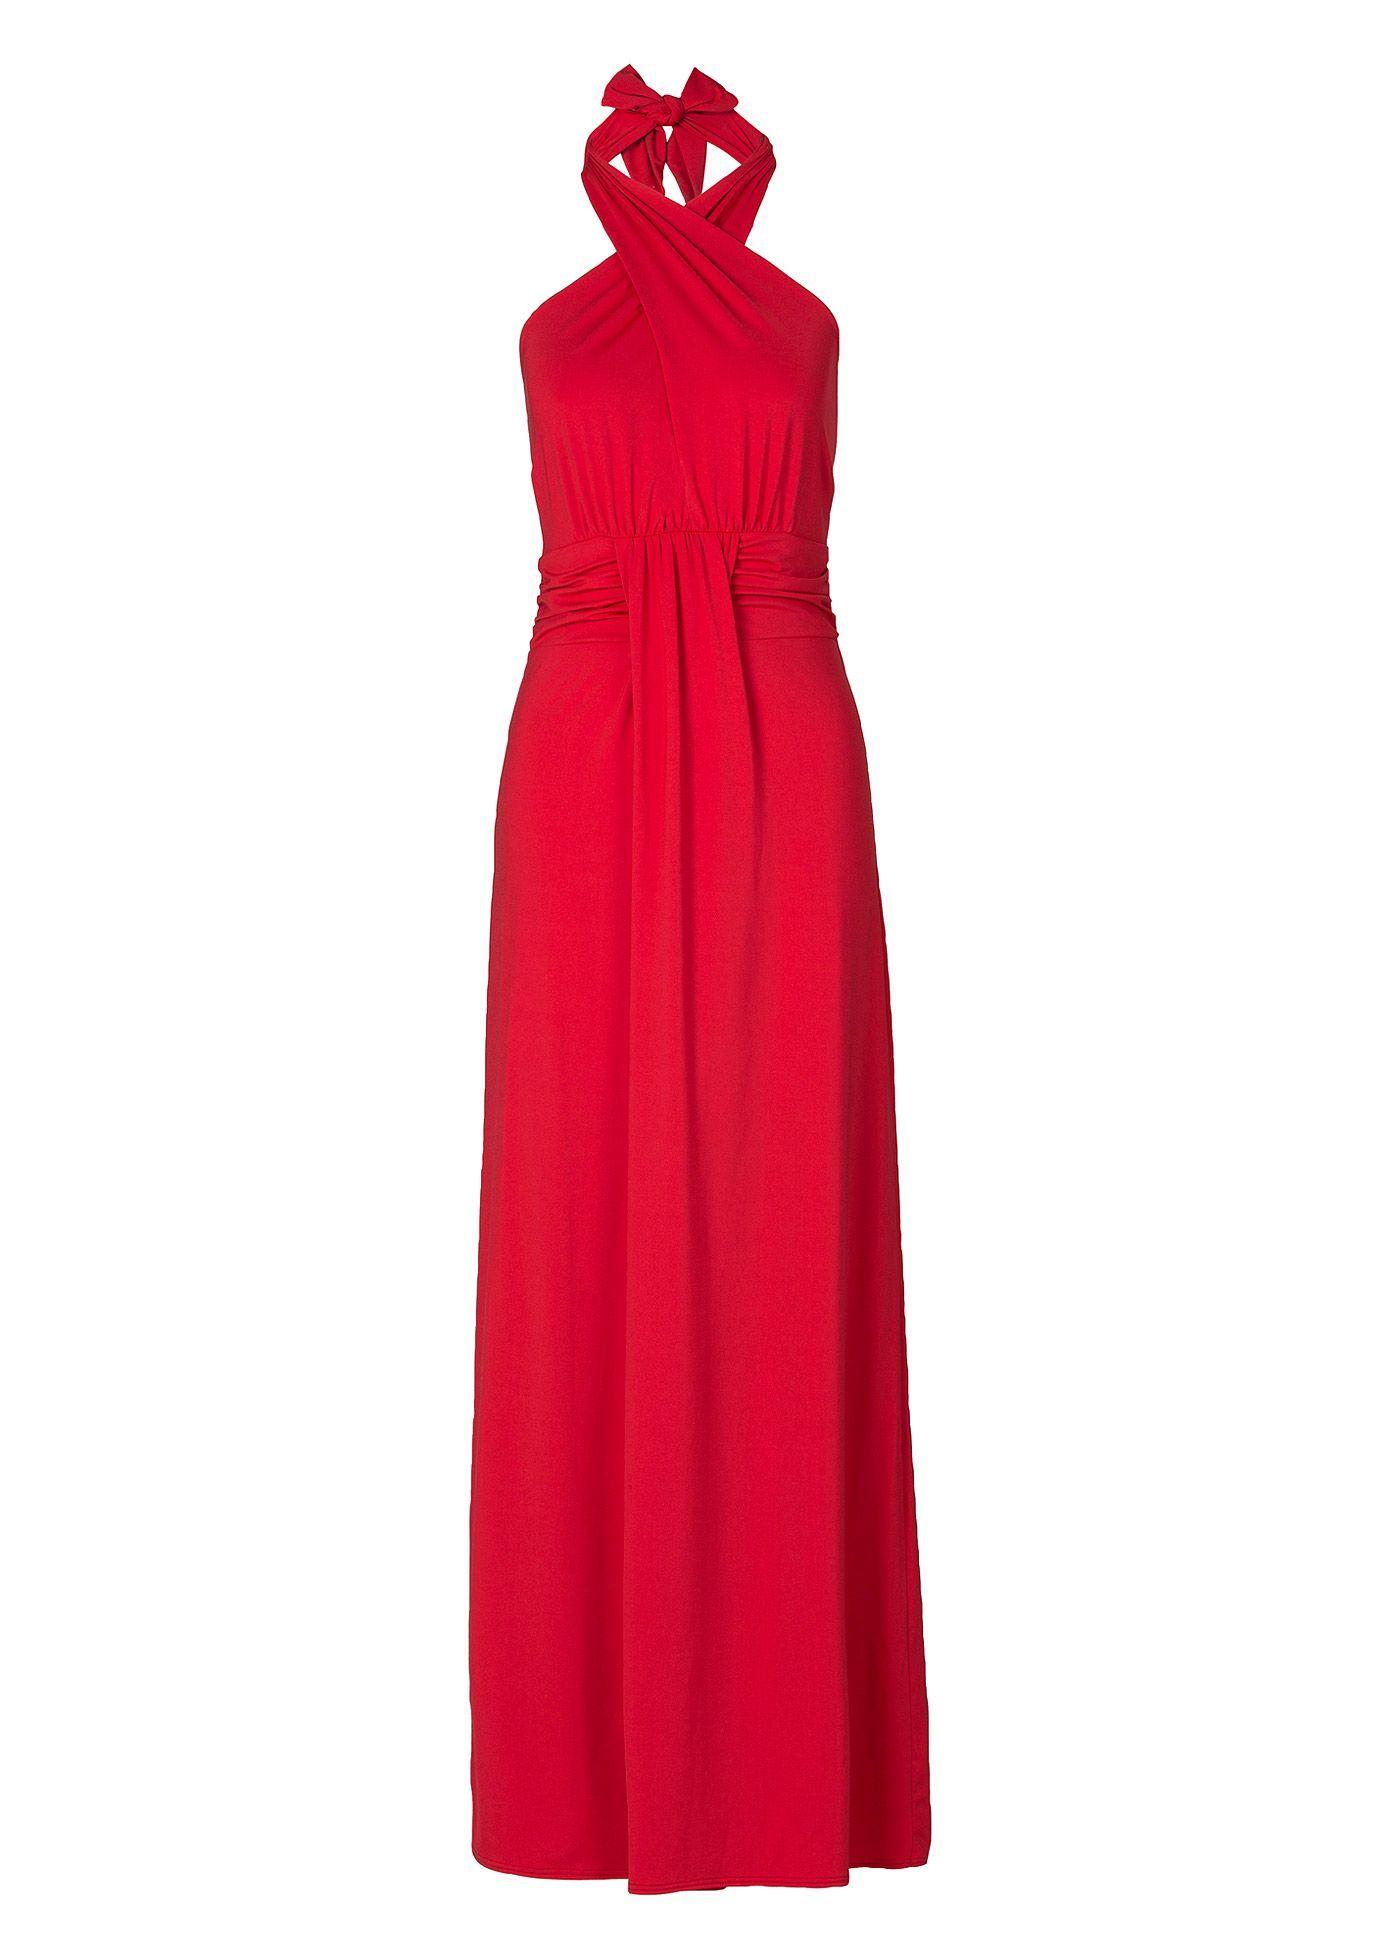 "Vestido frente única por R$119,00 na <a href=""https://ad.zanox.com/ppc/?35169379C64151105&ULP=[[http://ssl.hurra.com/TrackIt?tid=10055786C3651PPC&url=http://www.bonprix.com.br/produto/vestido-frente-unica-vermelho-2379524/#image?landmark=Entry&wkz=98&iwl=121&typ=AFF&anbieter=Zanox&aktion=Start&version=Tool]]"" rel=""nofollow"" target=""blank_""> Bonprix </a>"